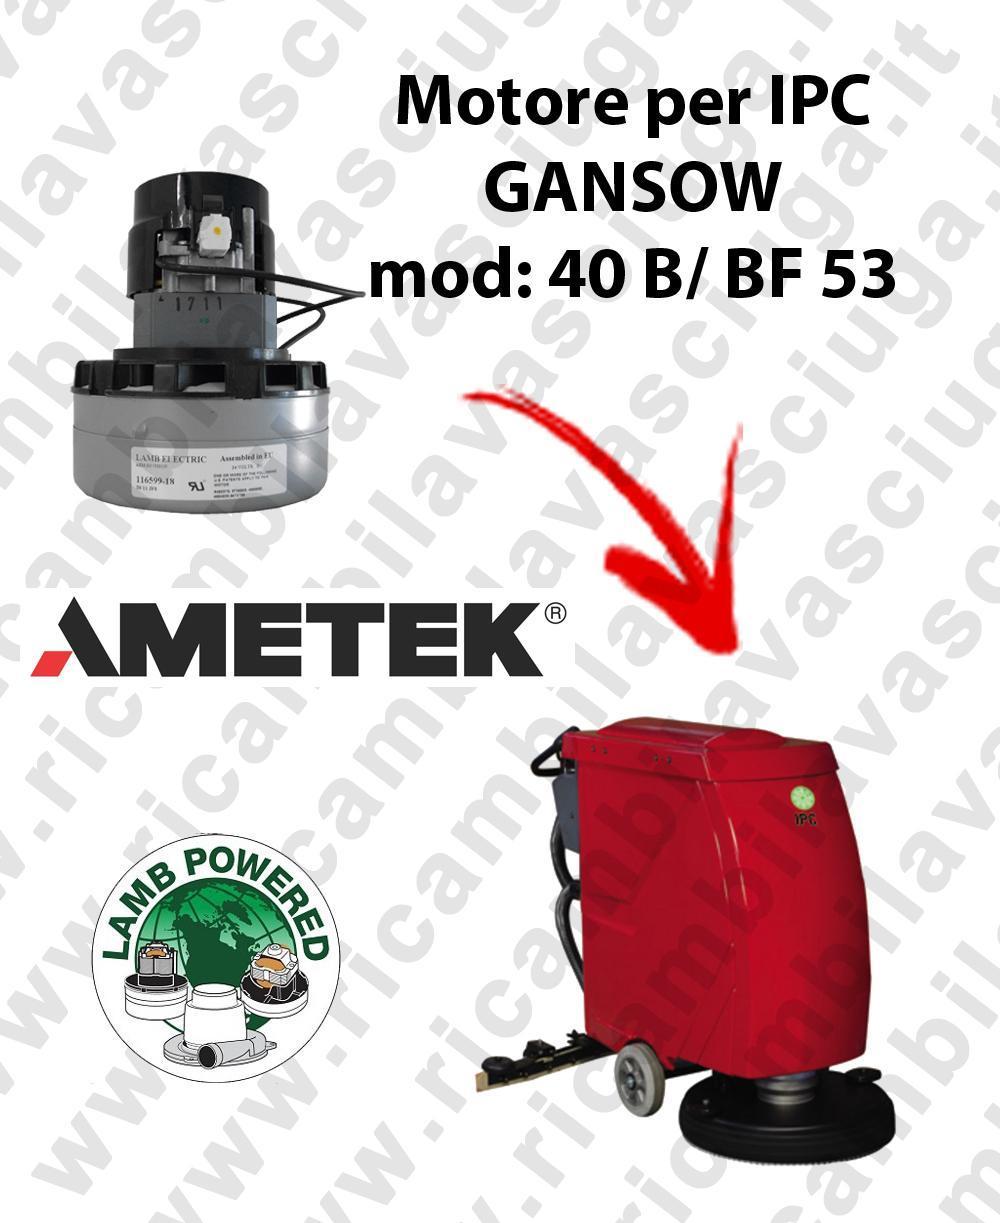 40 B/BF 53 Motore de aspiración LAMB AMETEK para fregadora IPC GANSOW